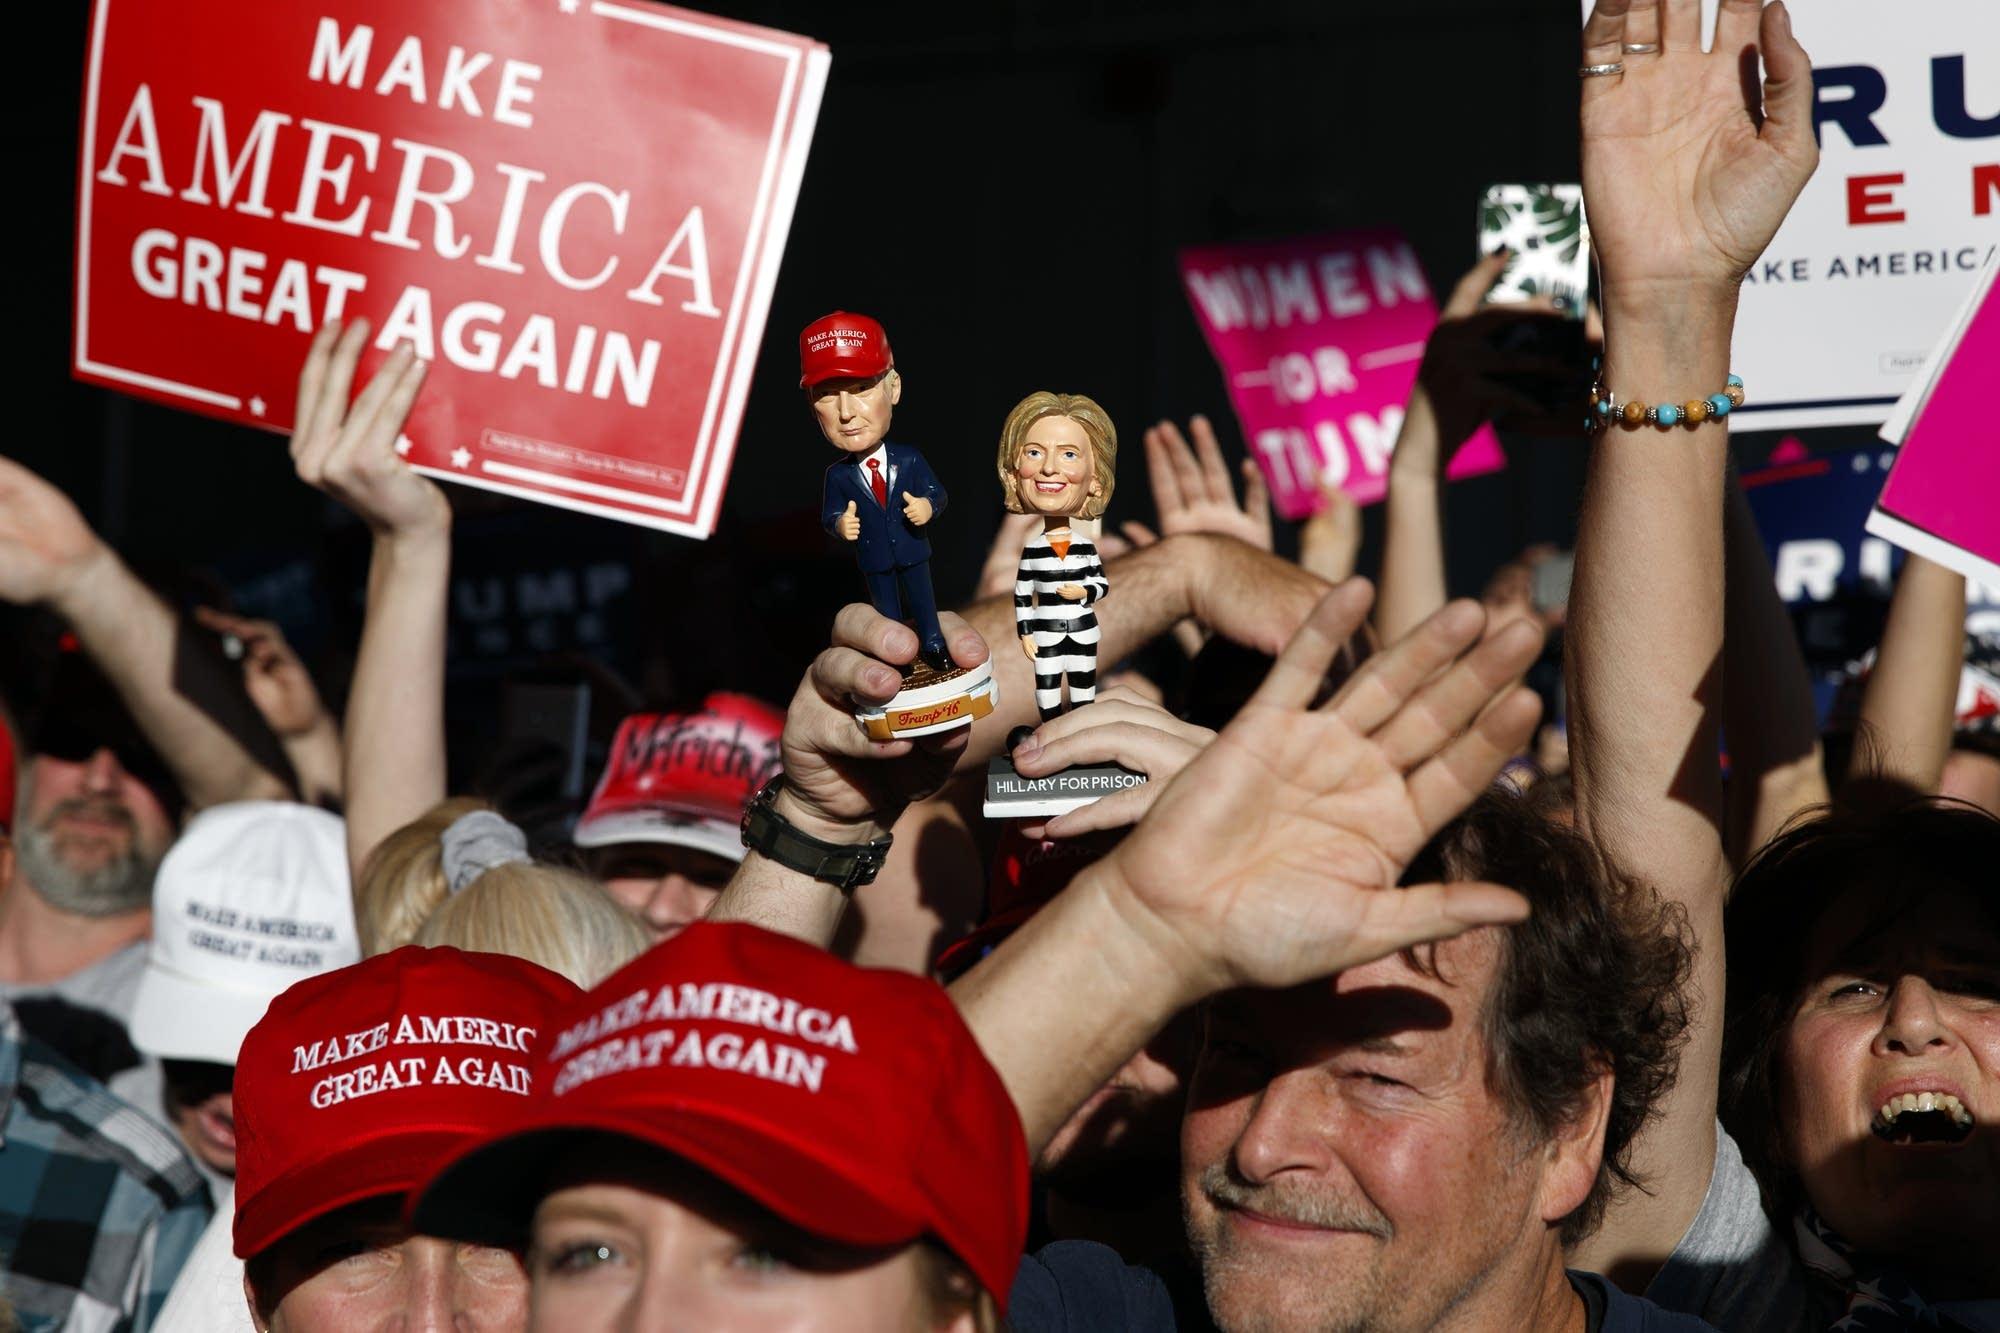 The scene of a Donald Trump campaign rally in Minneapolis